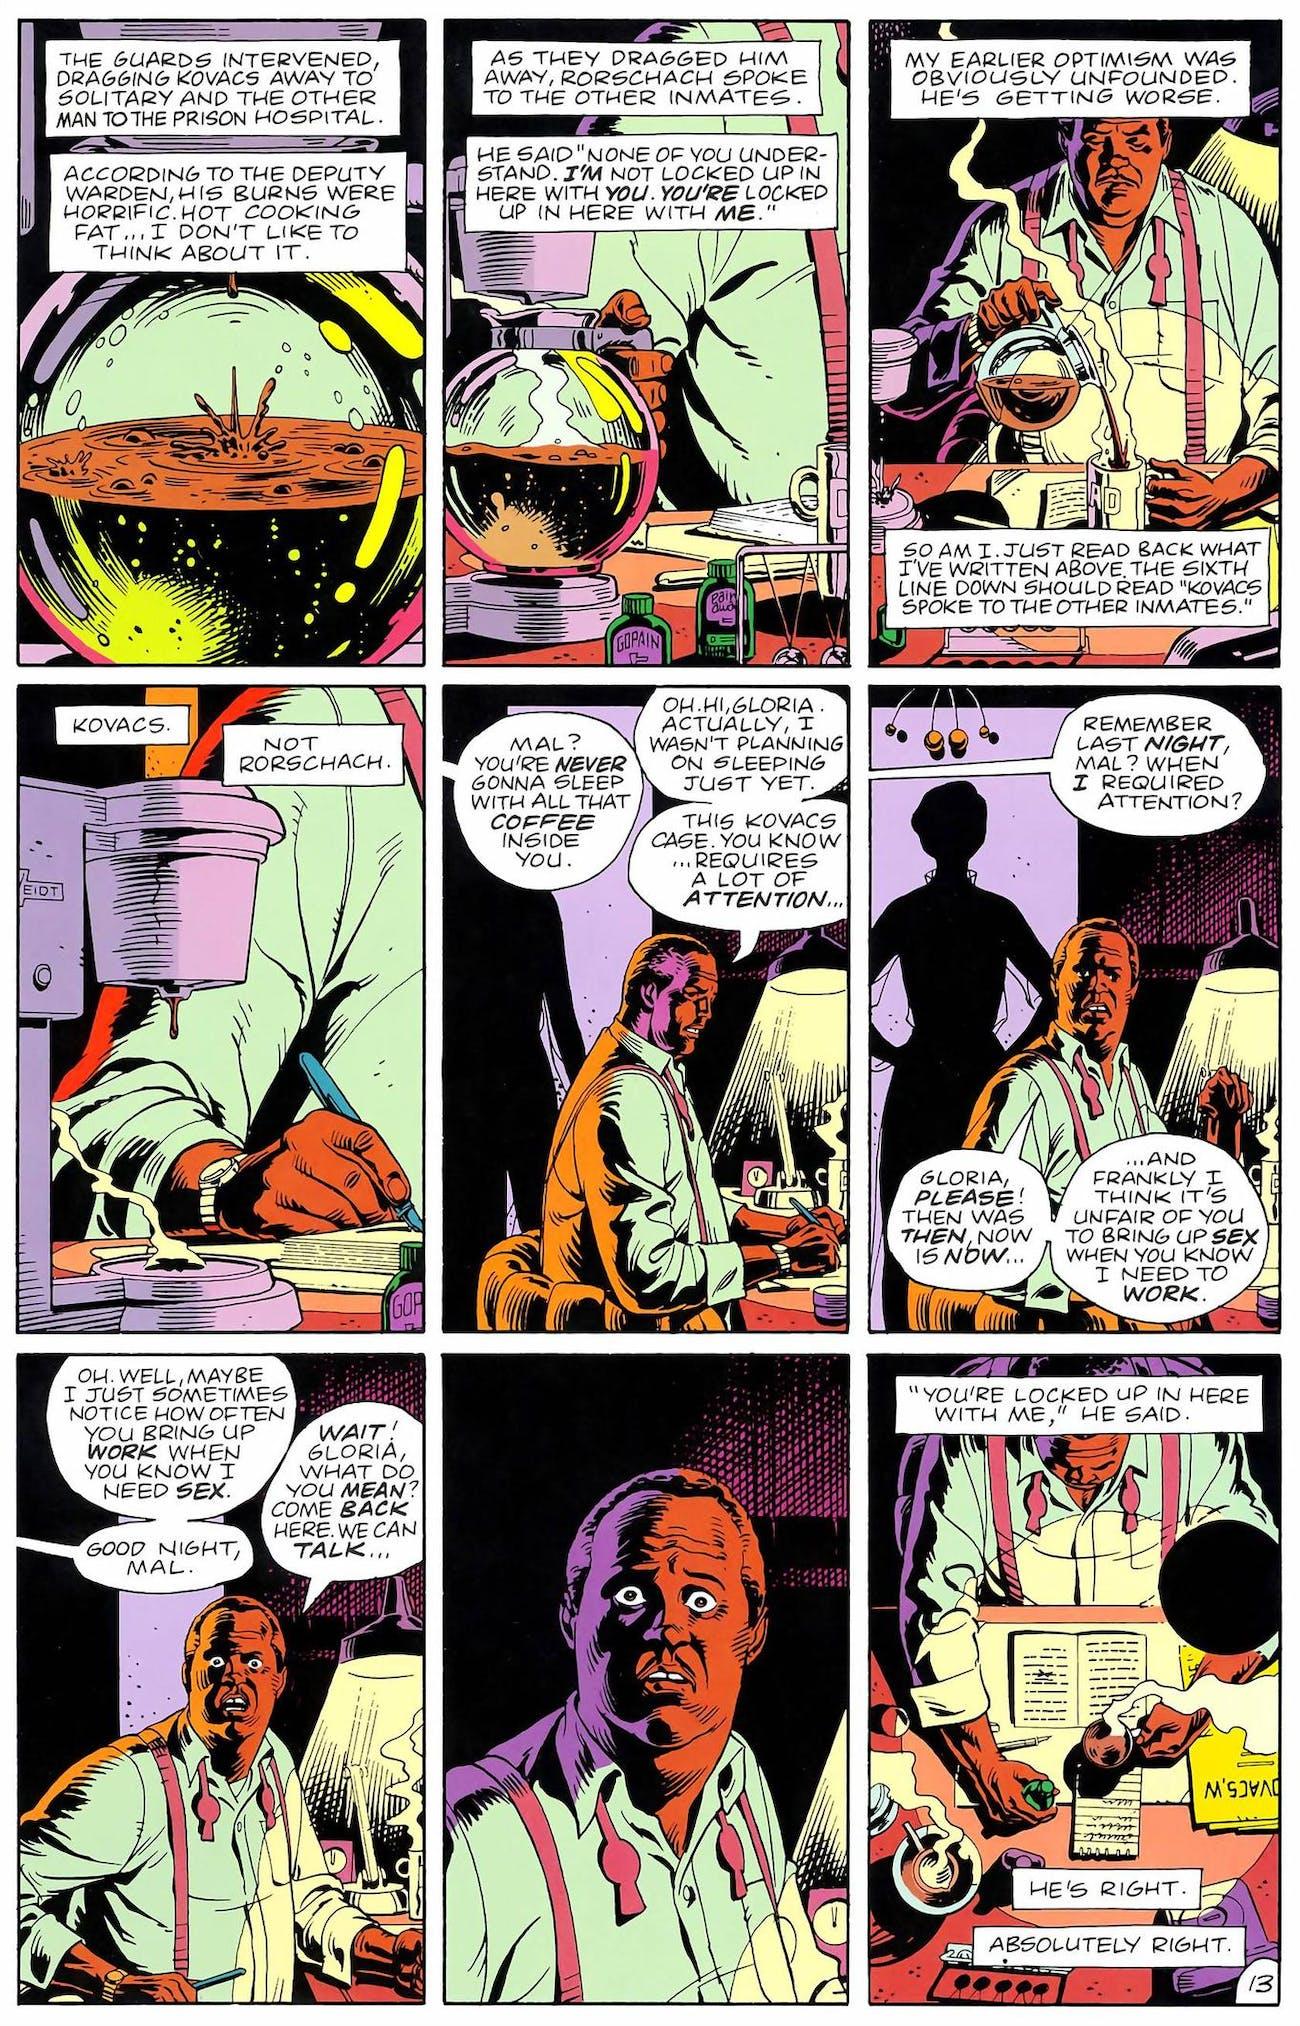 Watchmen Alexandria Ocasio-Cortez